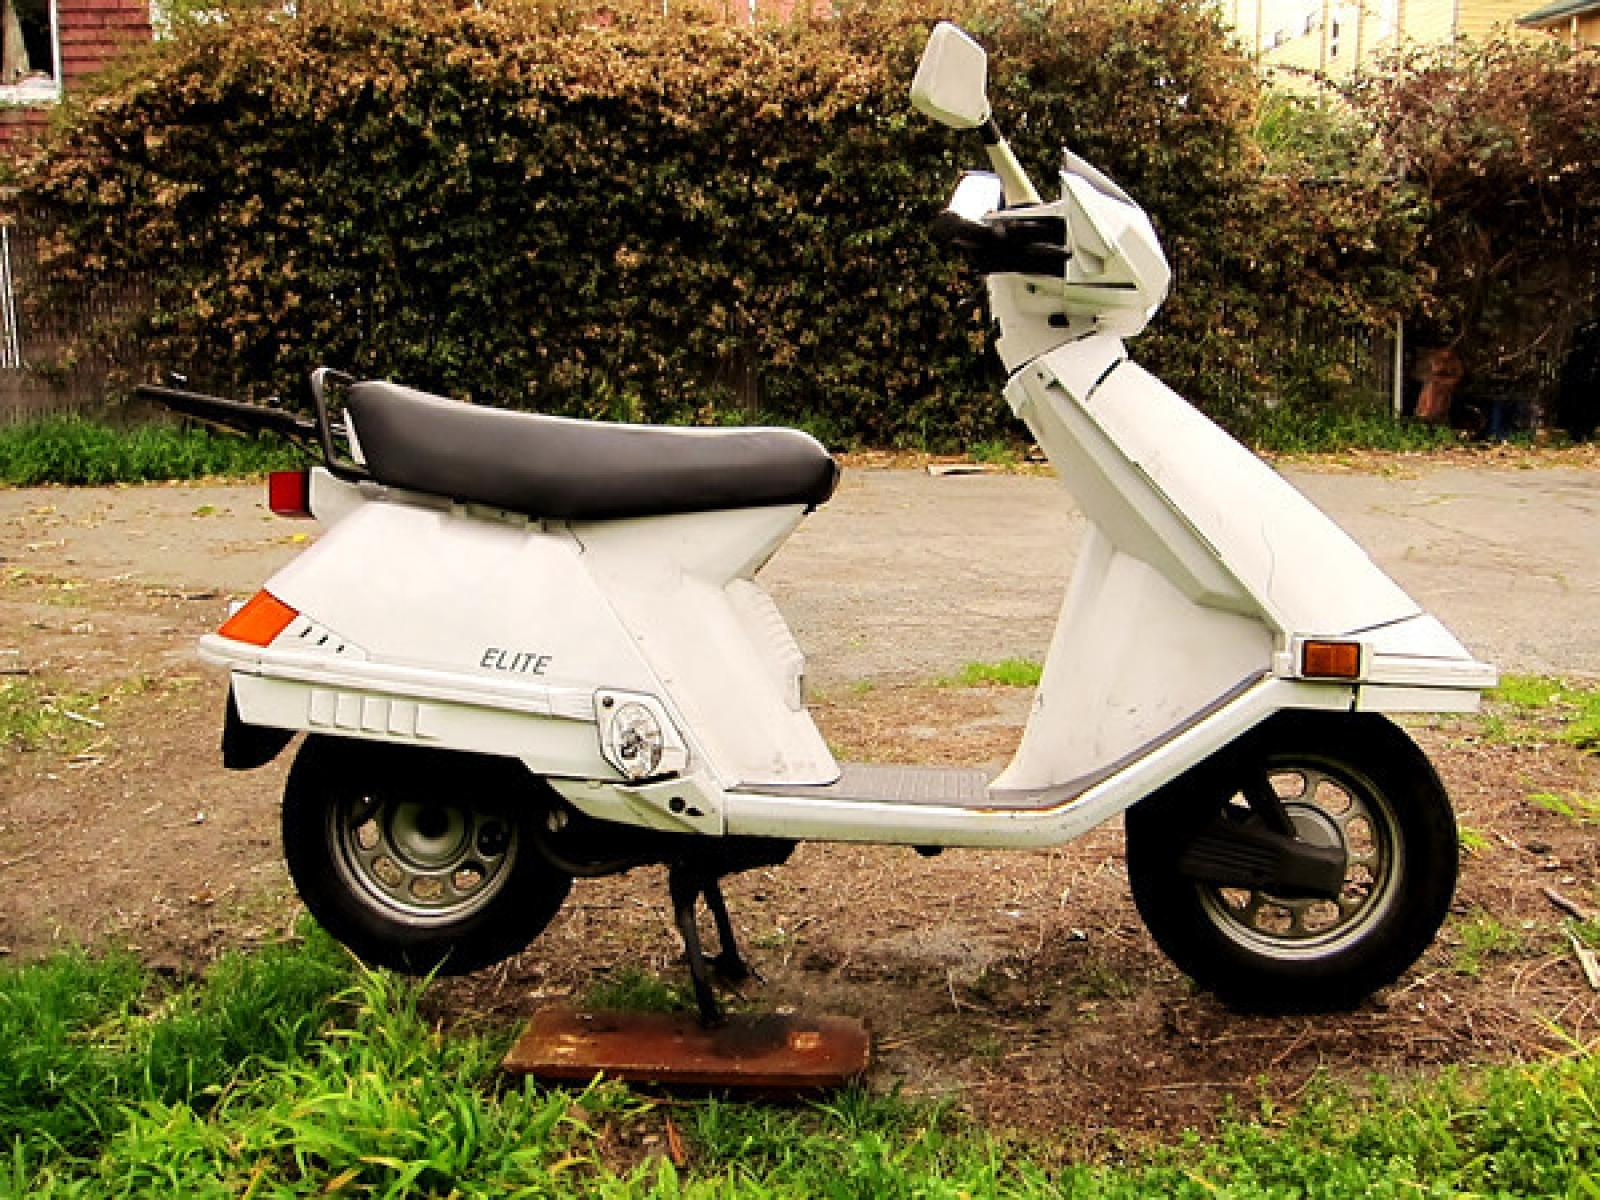 NR_4733] Diagram Of Honda Scooter Parts 1985 Ch250 A Muffler Diagram Free  DiagramInrebe Trua Garna Tixat Mohammedshrine Librar Wiring 101